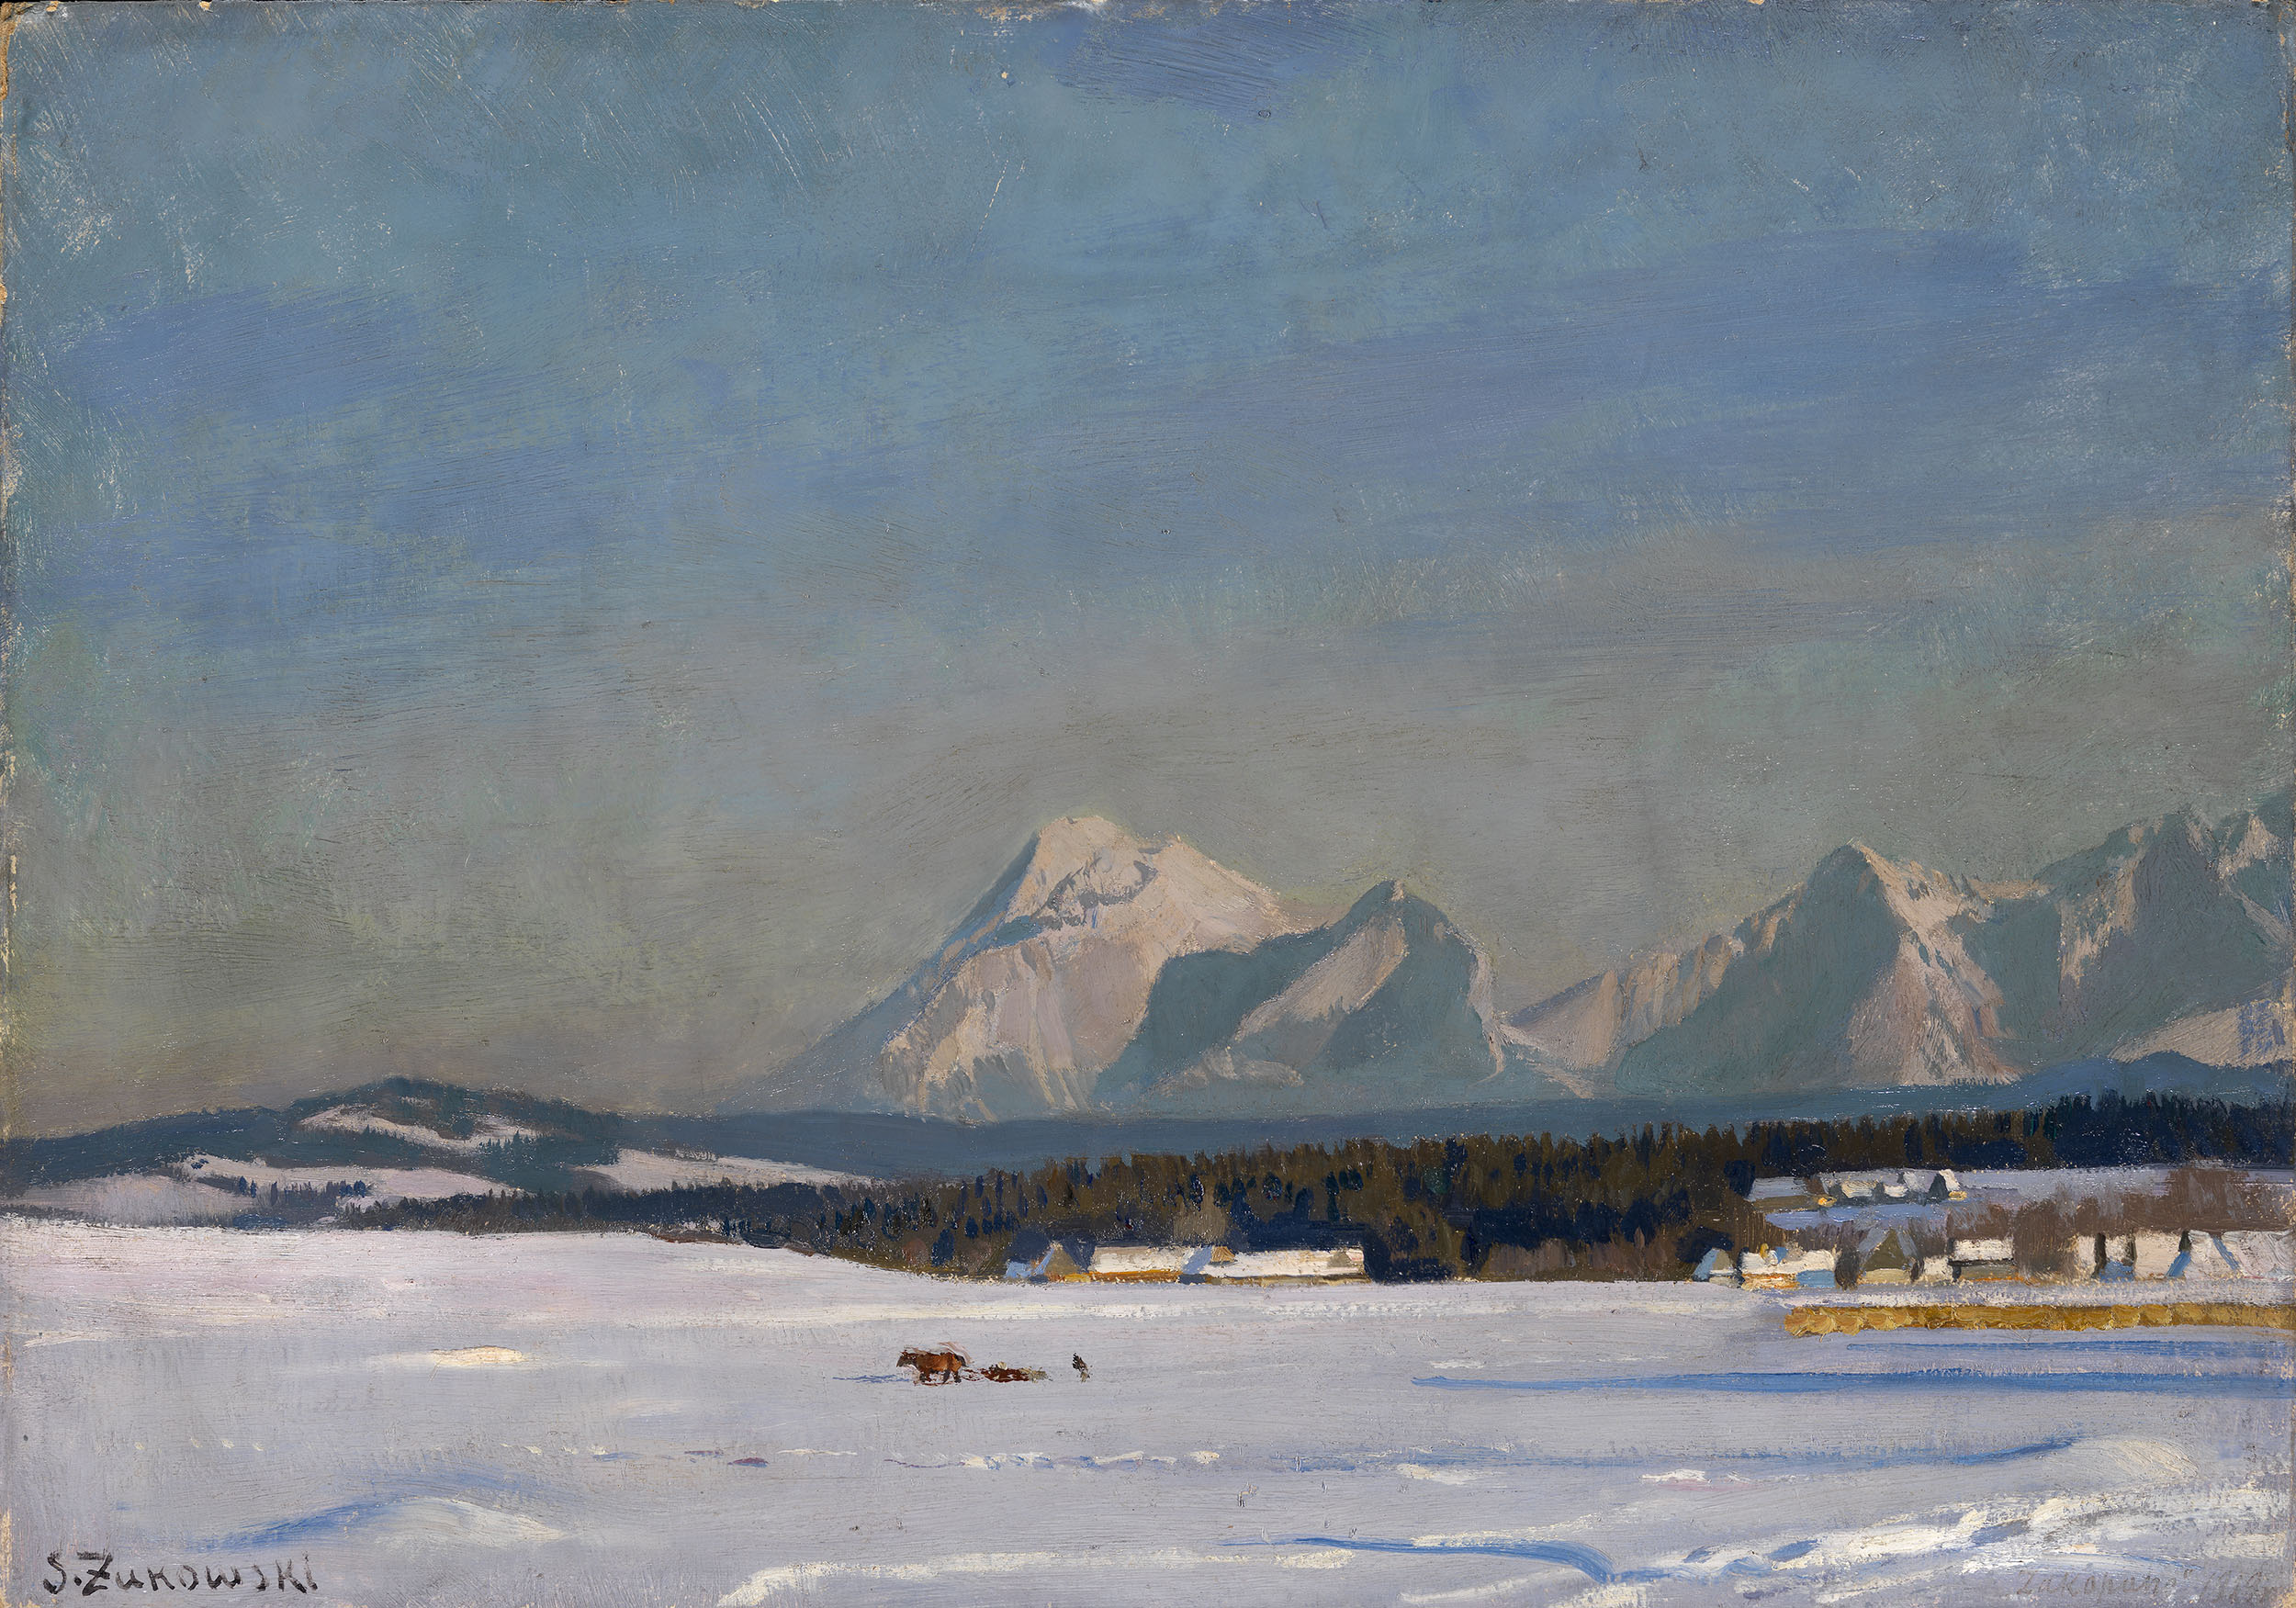 ZHUKOVSKY, STANISLAV Winter Landscape